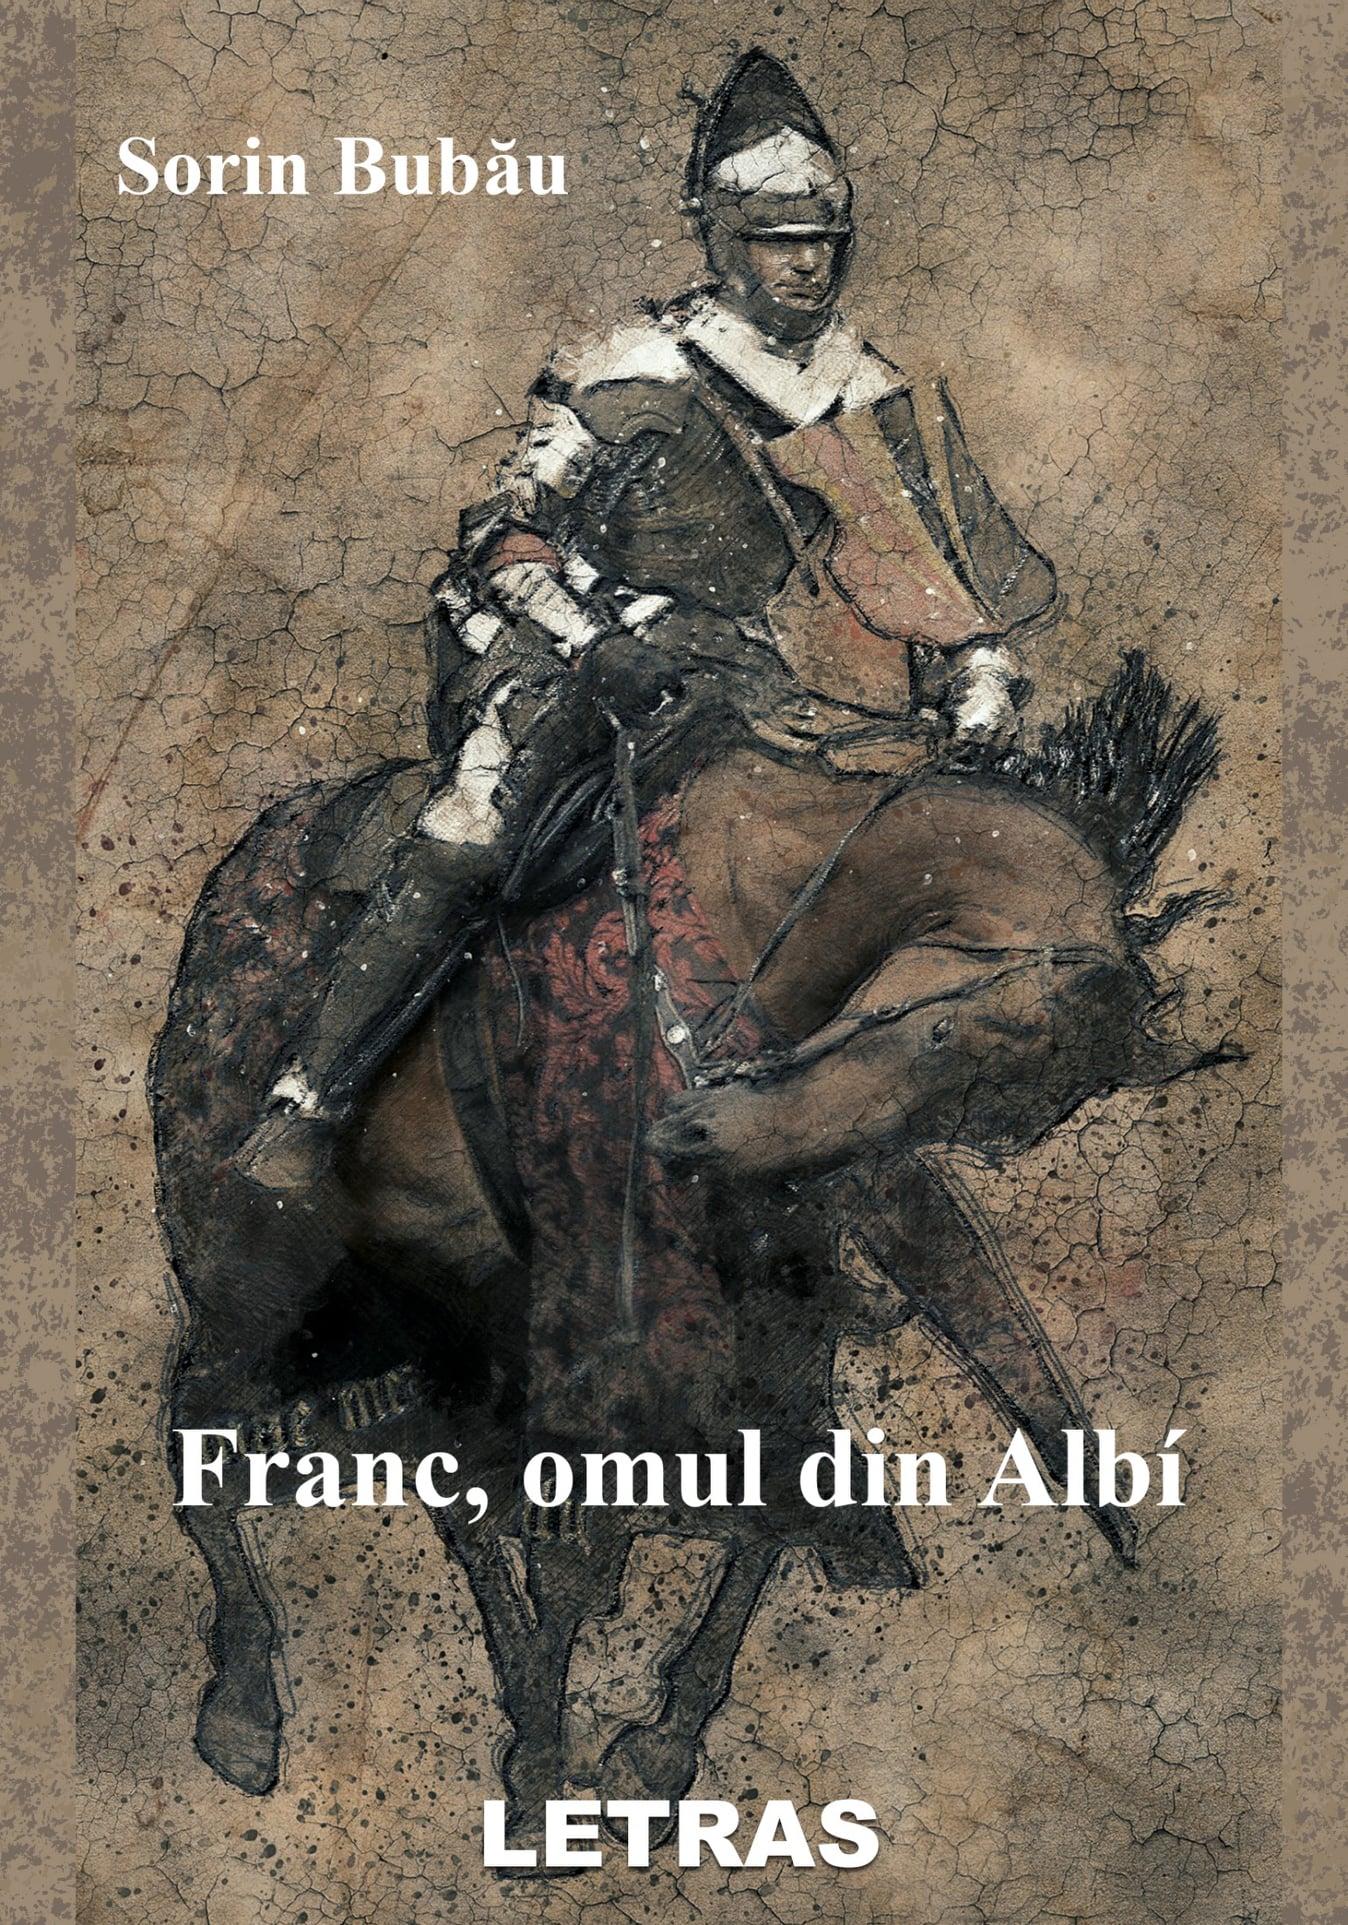 Franc, omul din Albí-Autor: Sorin Bubau